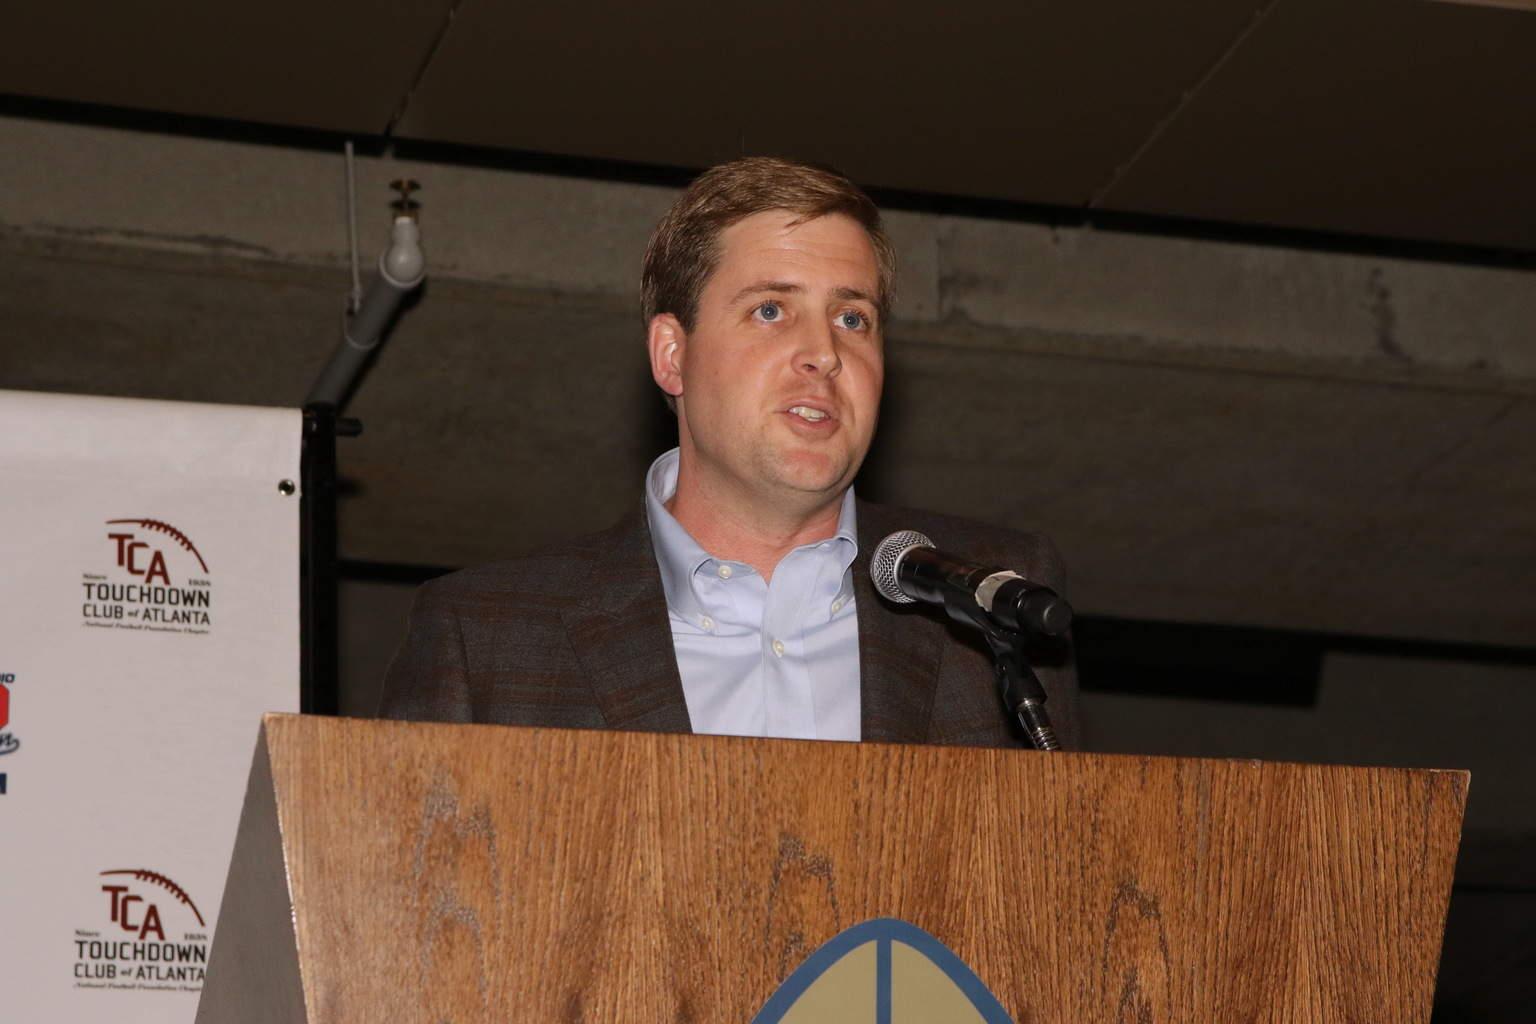 TCA Vice President Whit Ferguson